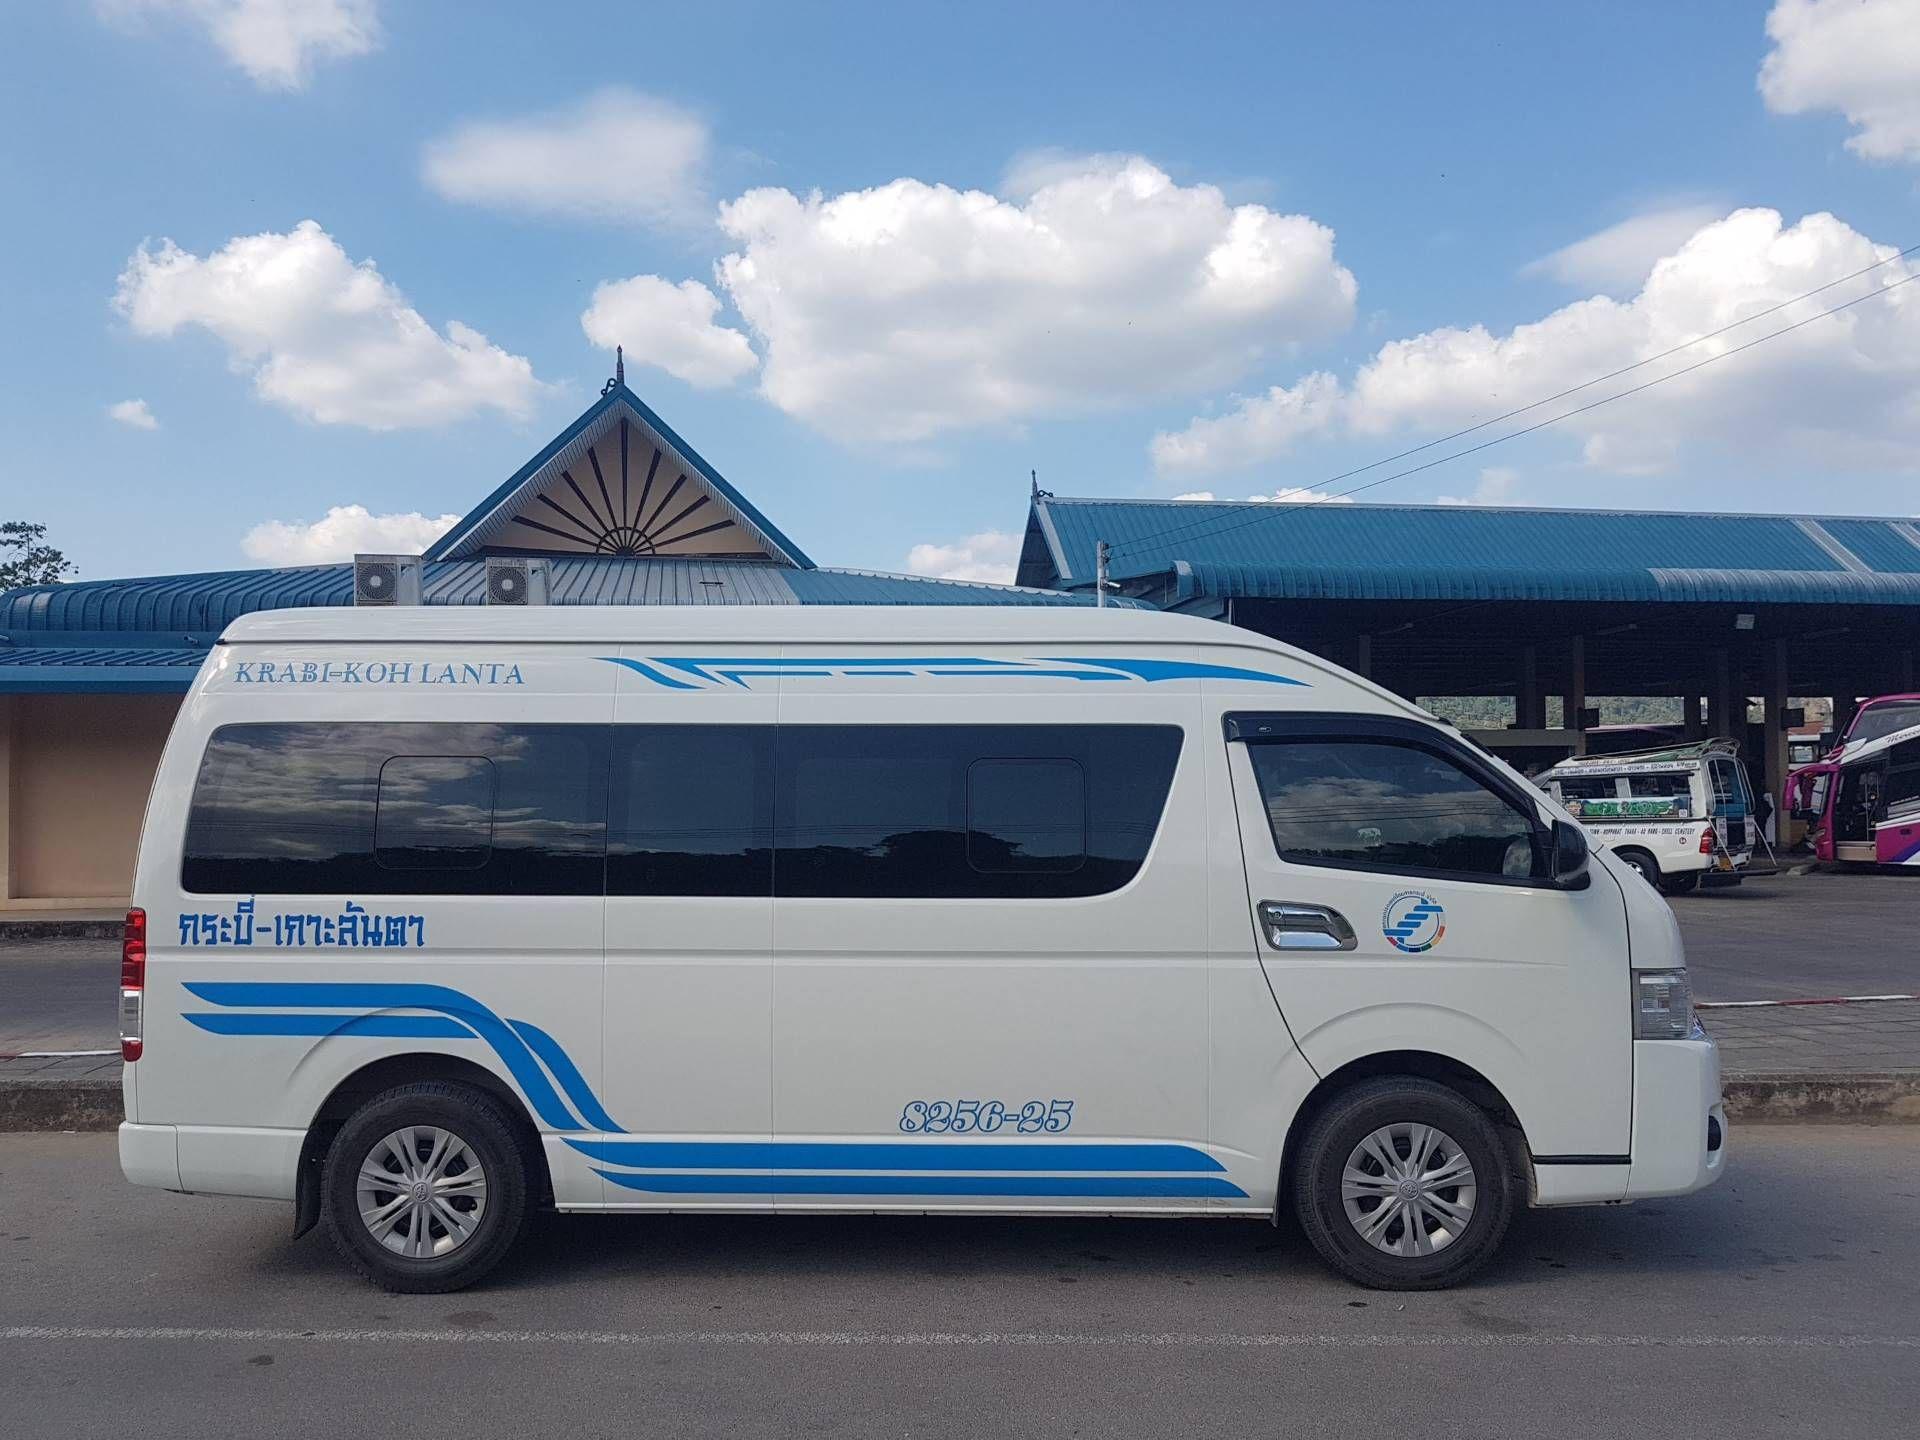 Standard Autobus + Traghetto